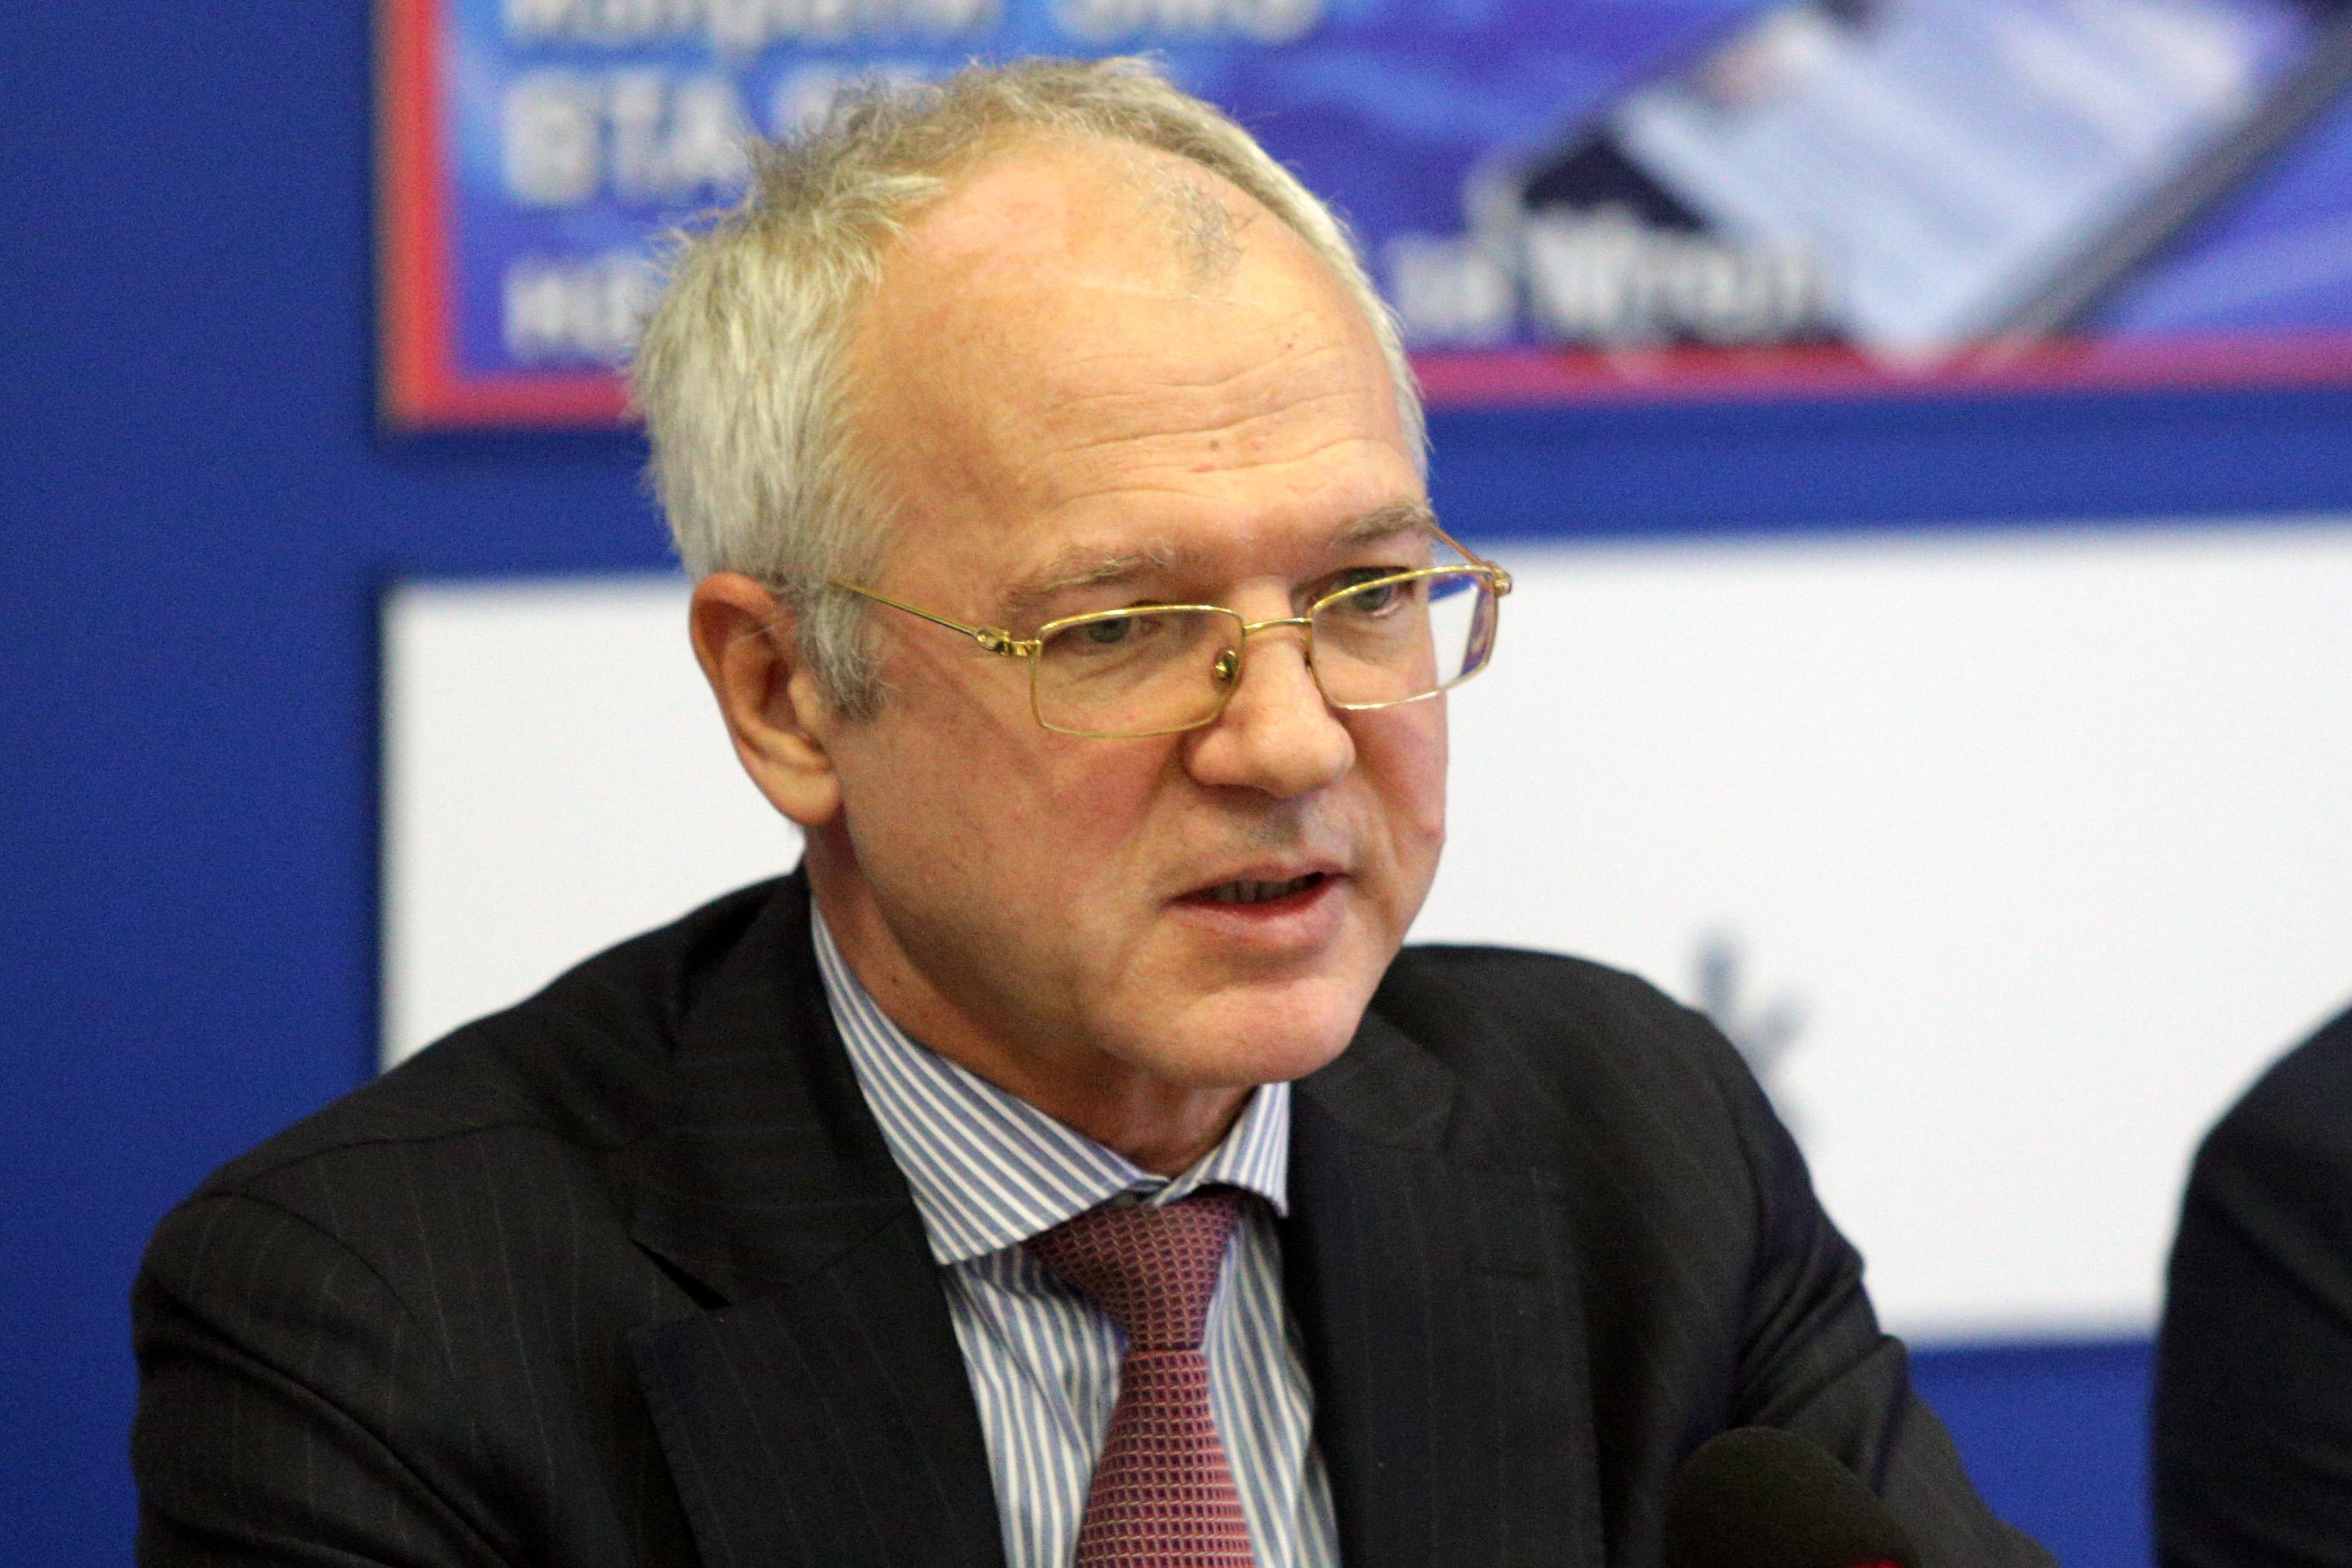 АИКБ иска повече чужди работници у нас   Бизнес.dir.bg